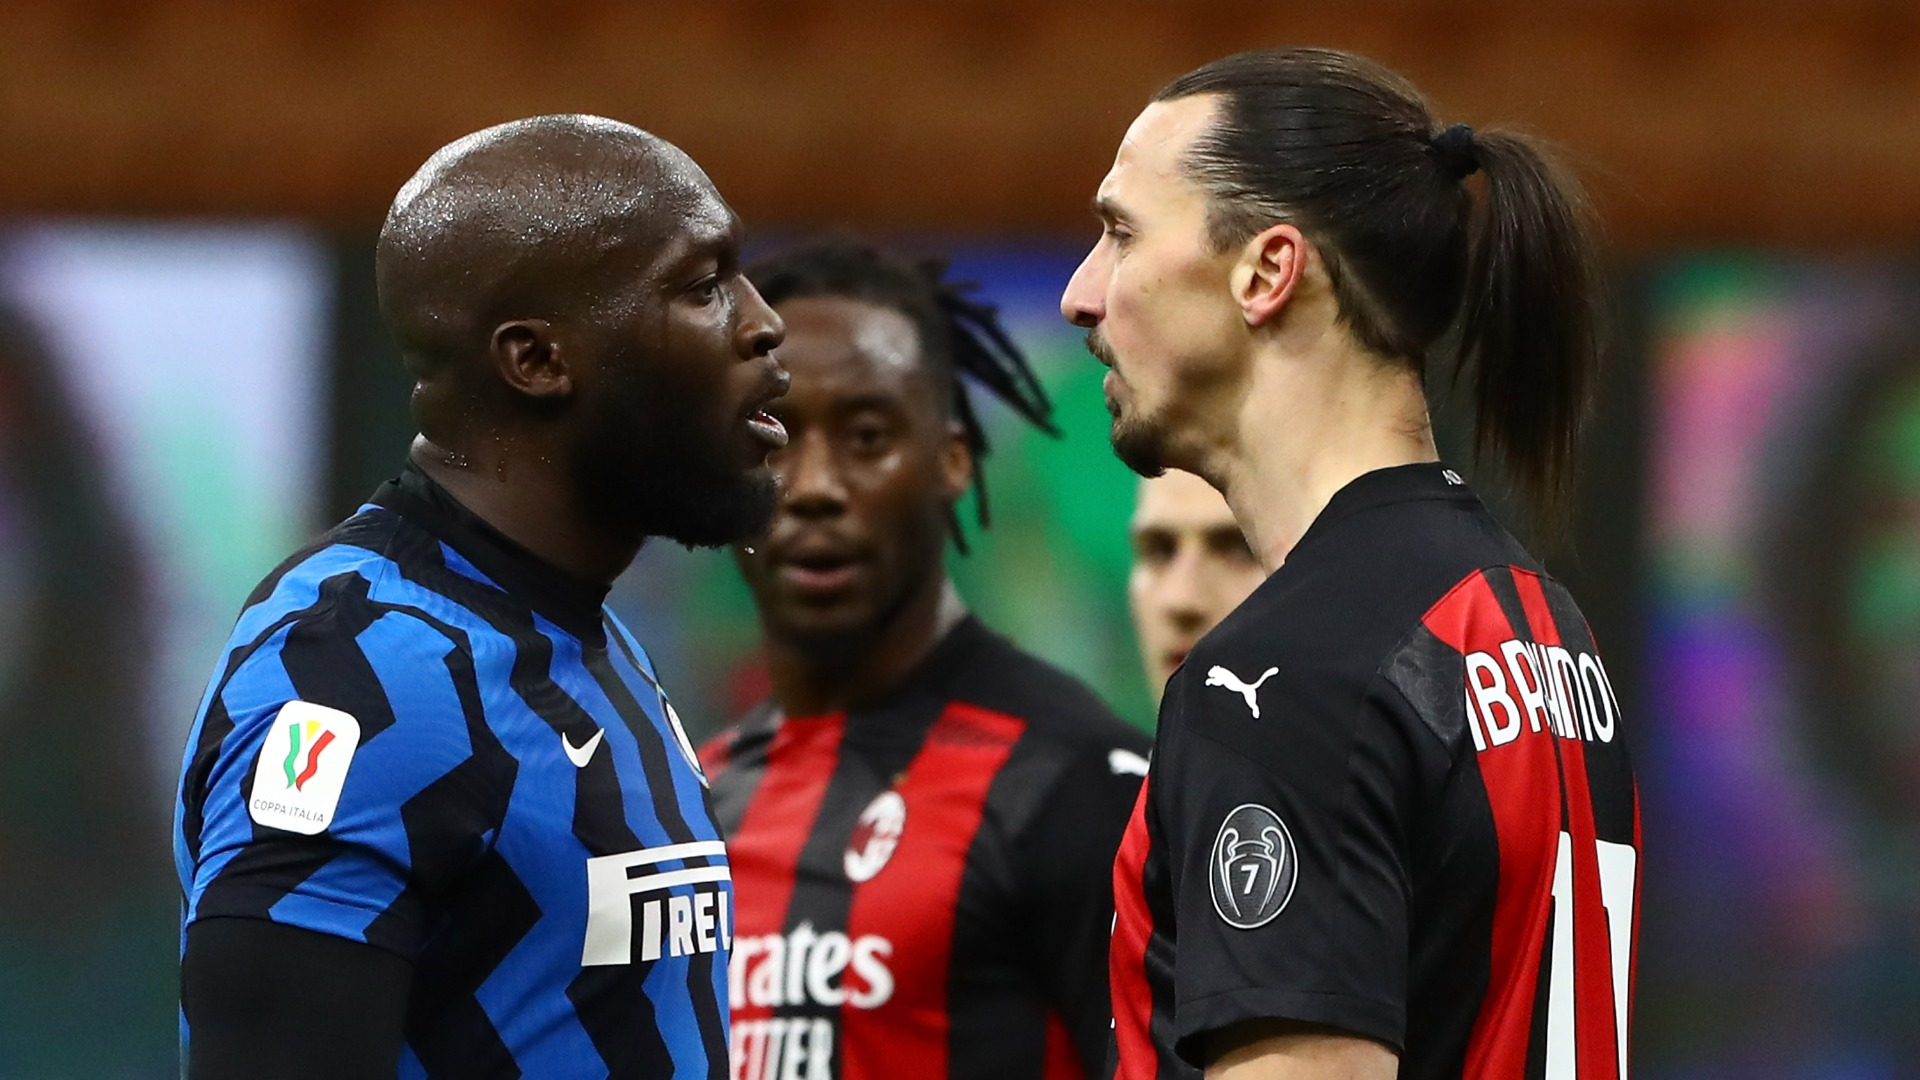 Ibrahimovic denies using racist insults in heated Lukaku clash